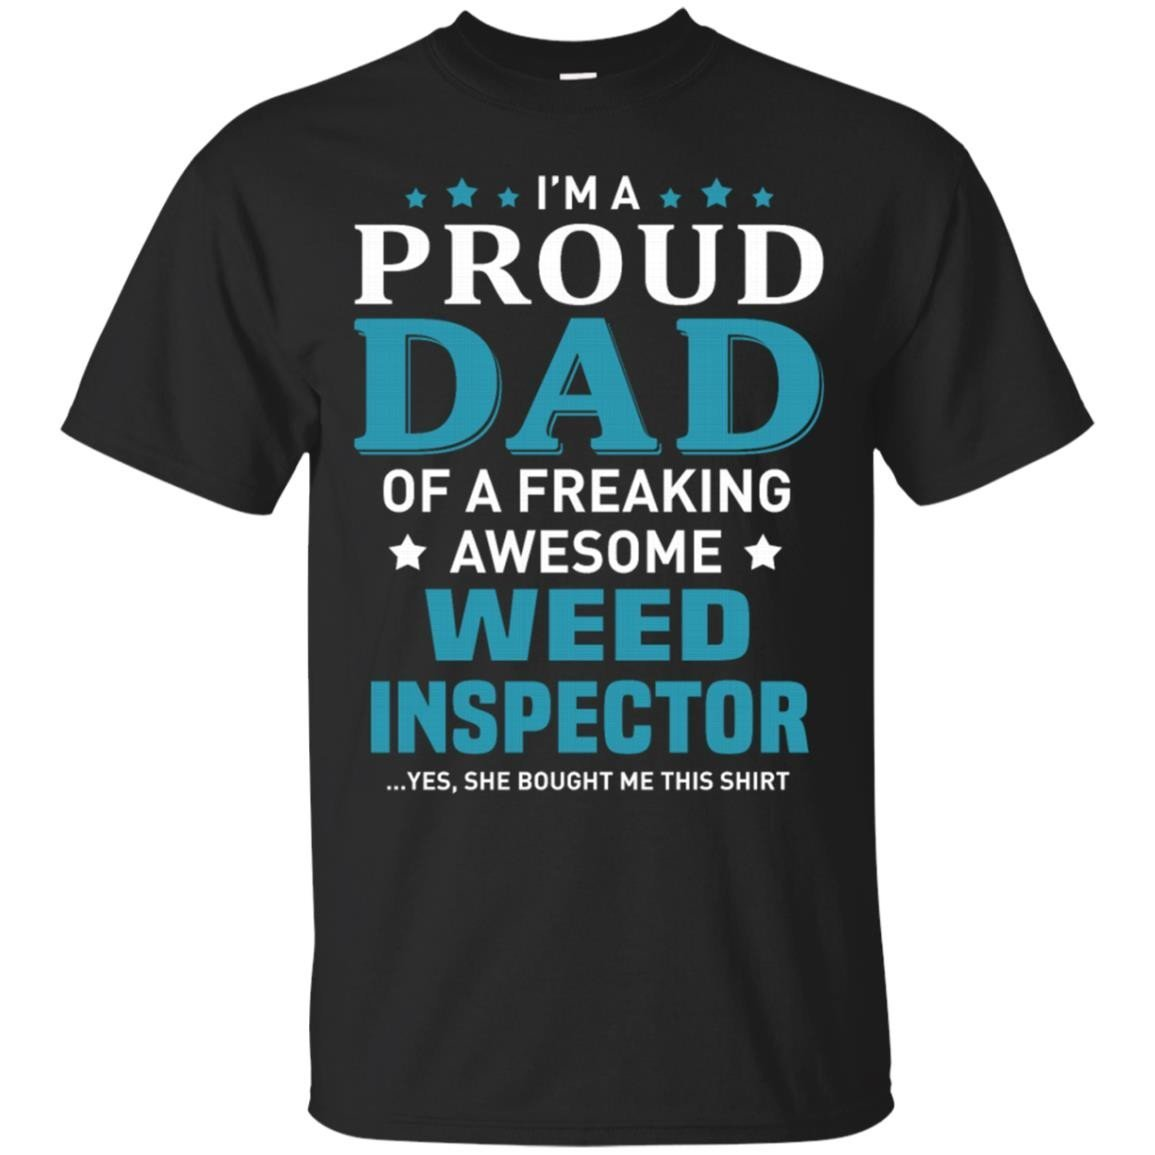 Weed Inspector T-Shirt Men